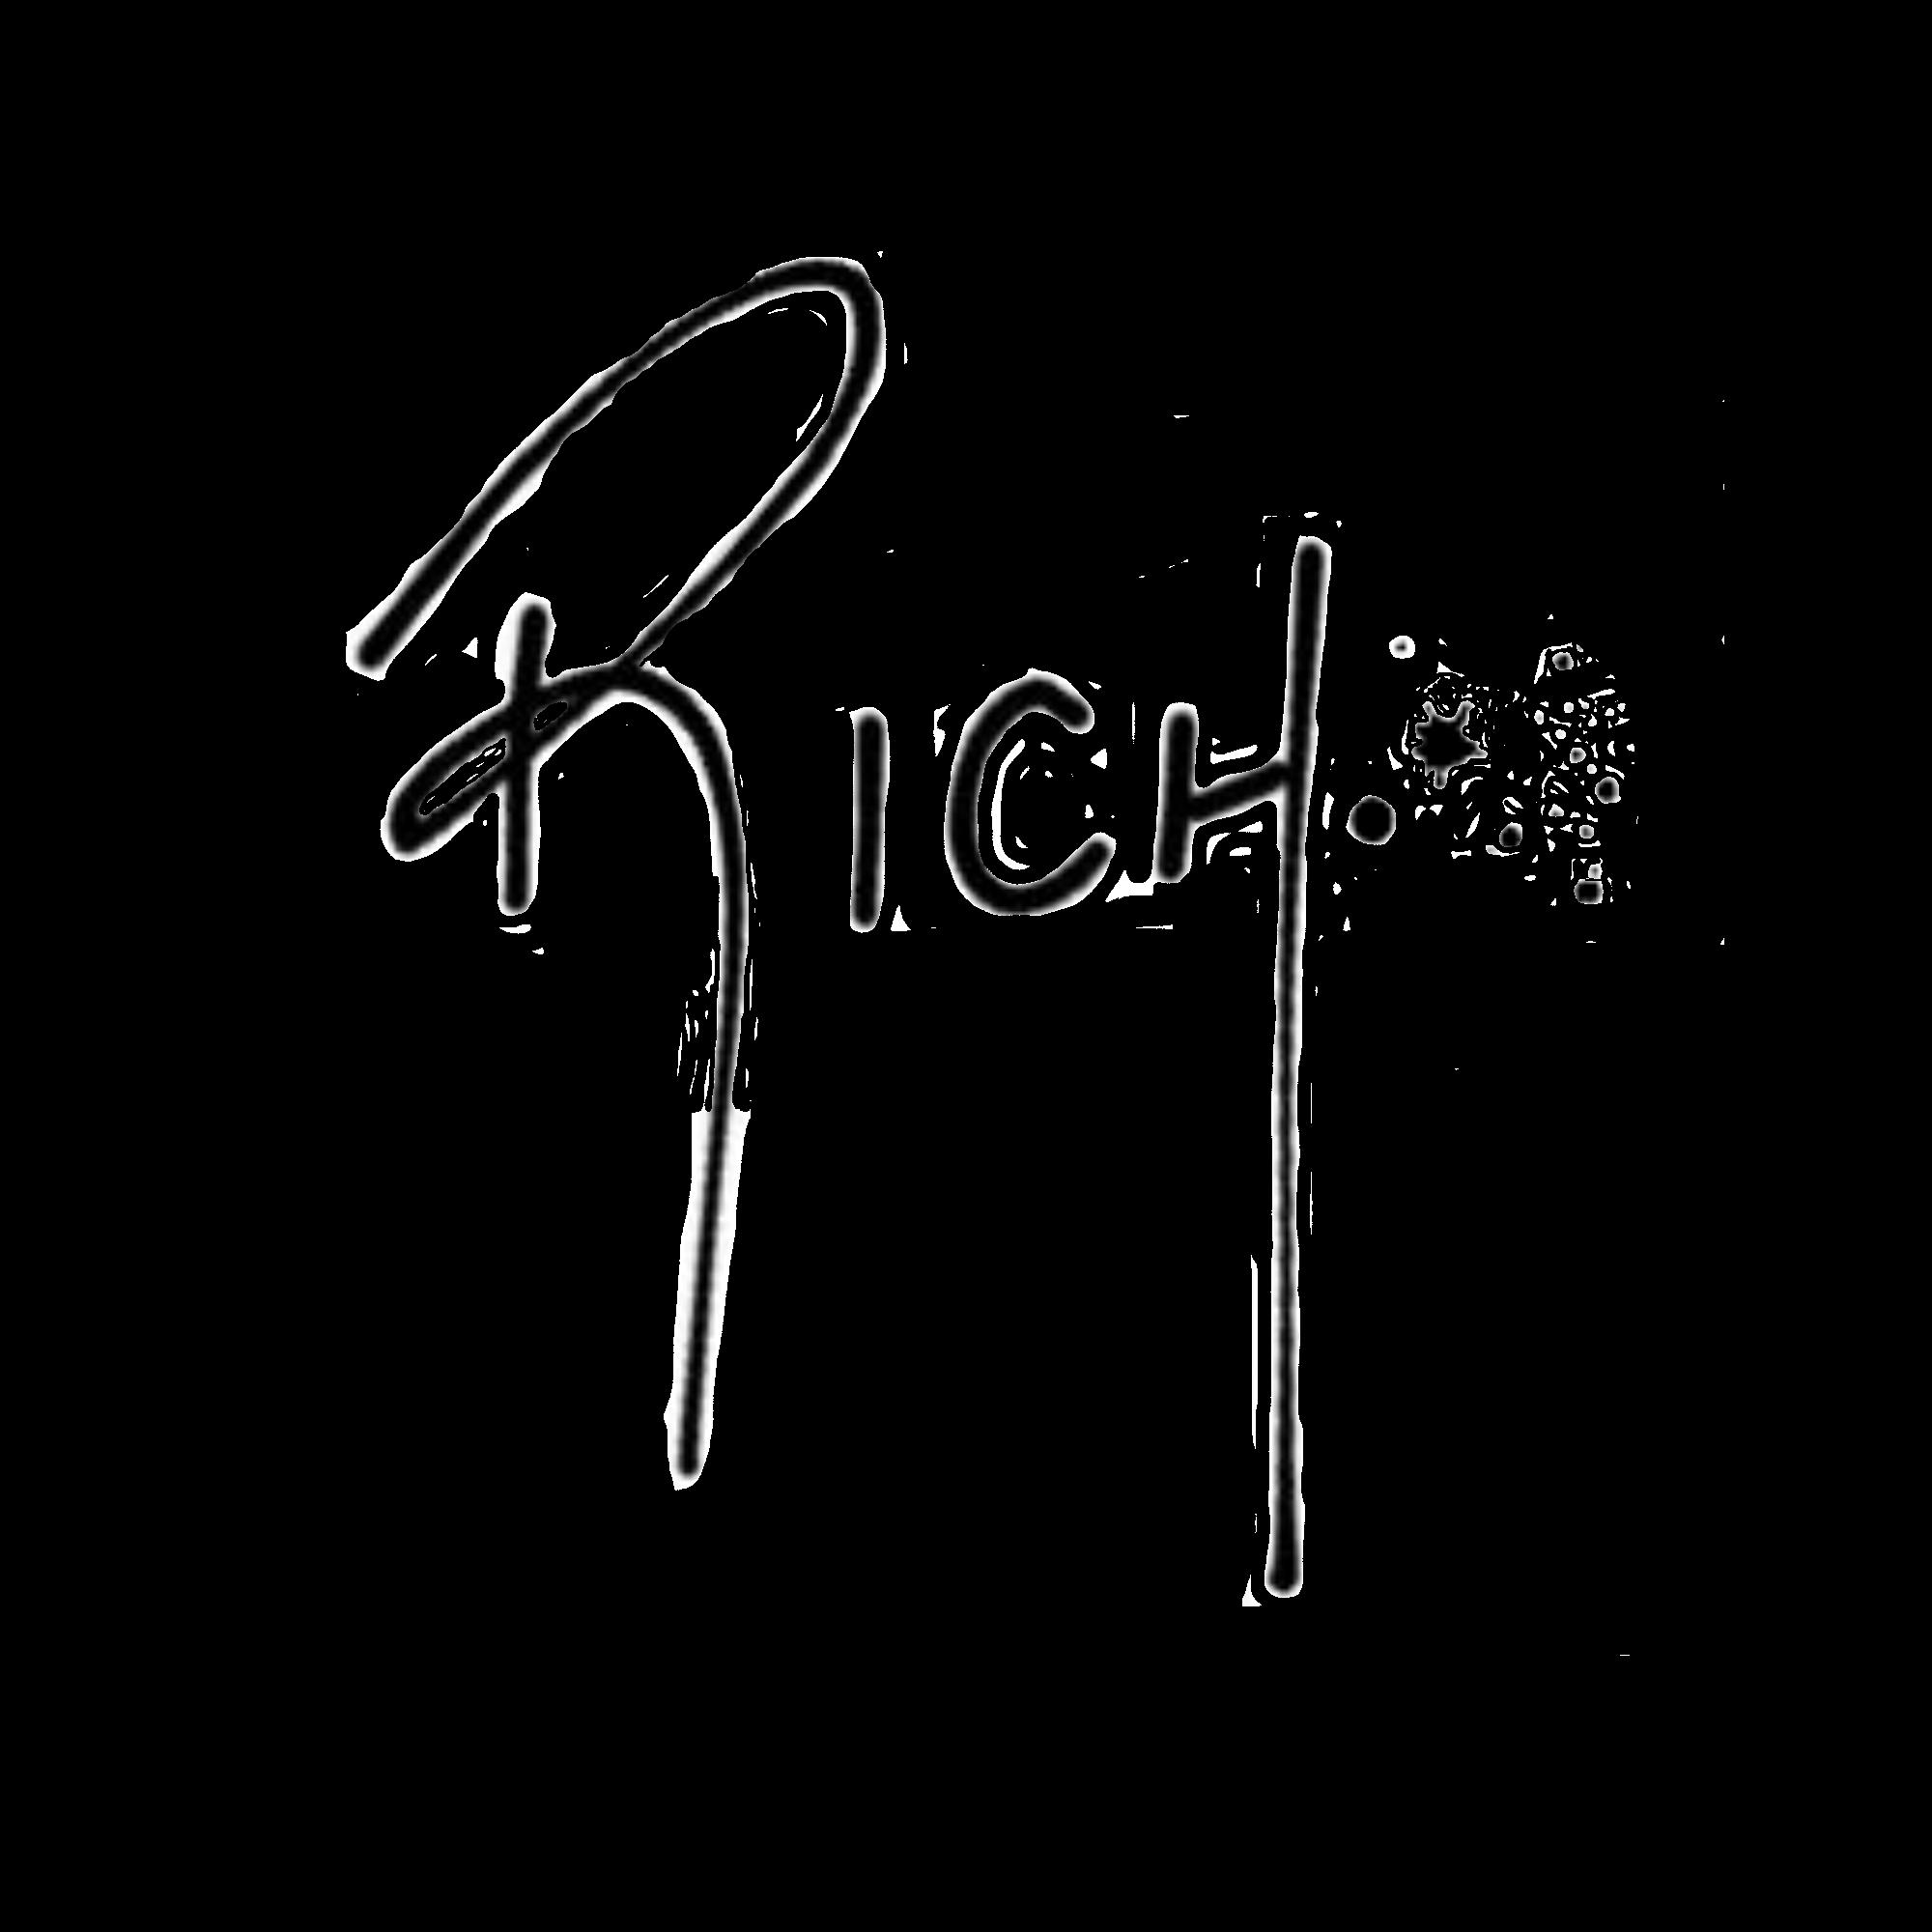 Anthony Ricciardi Signature